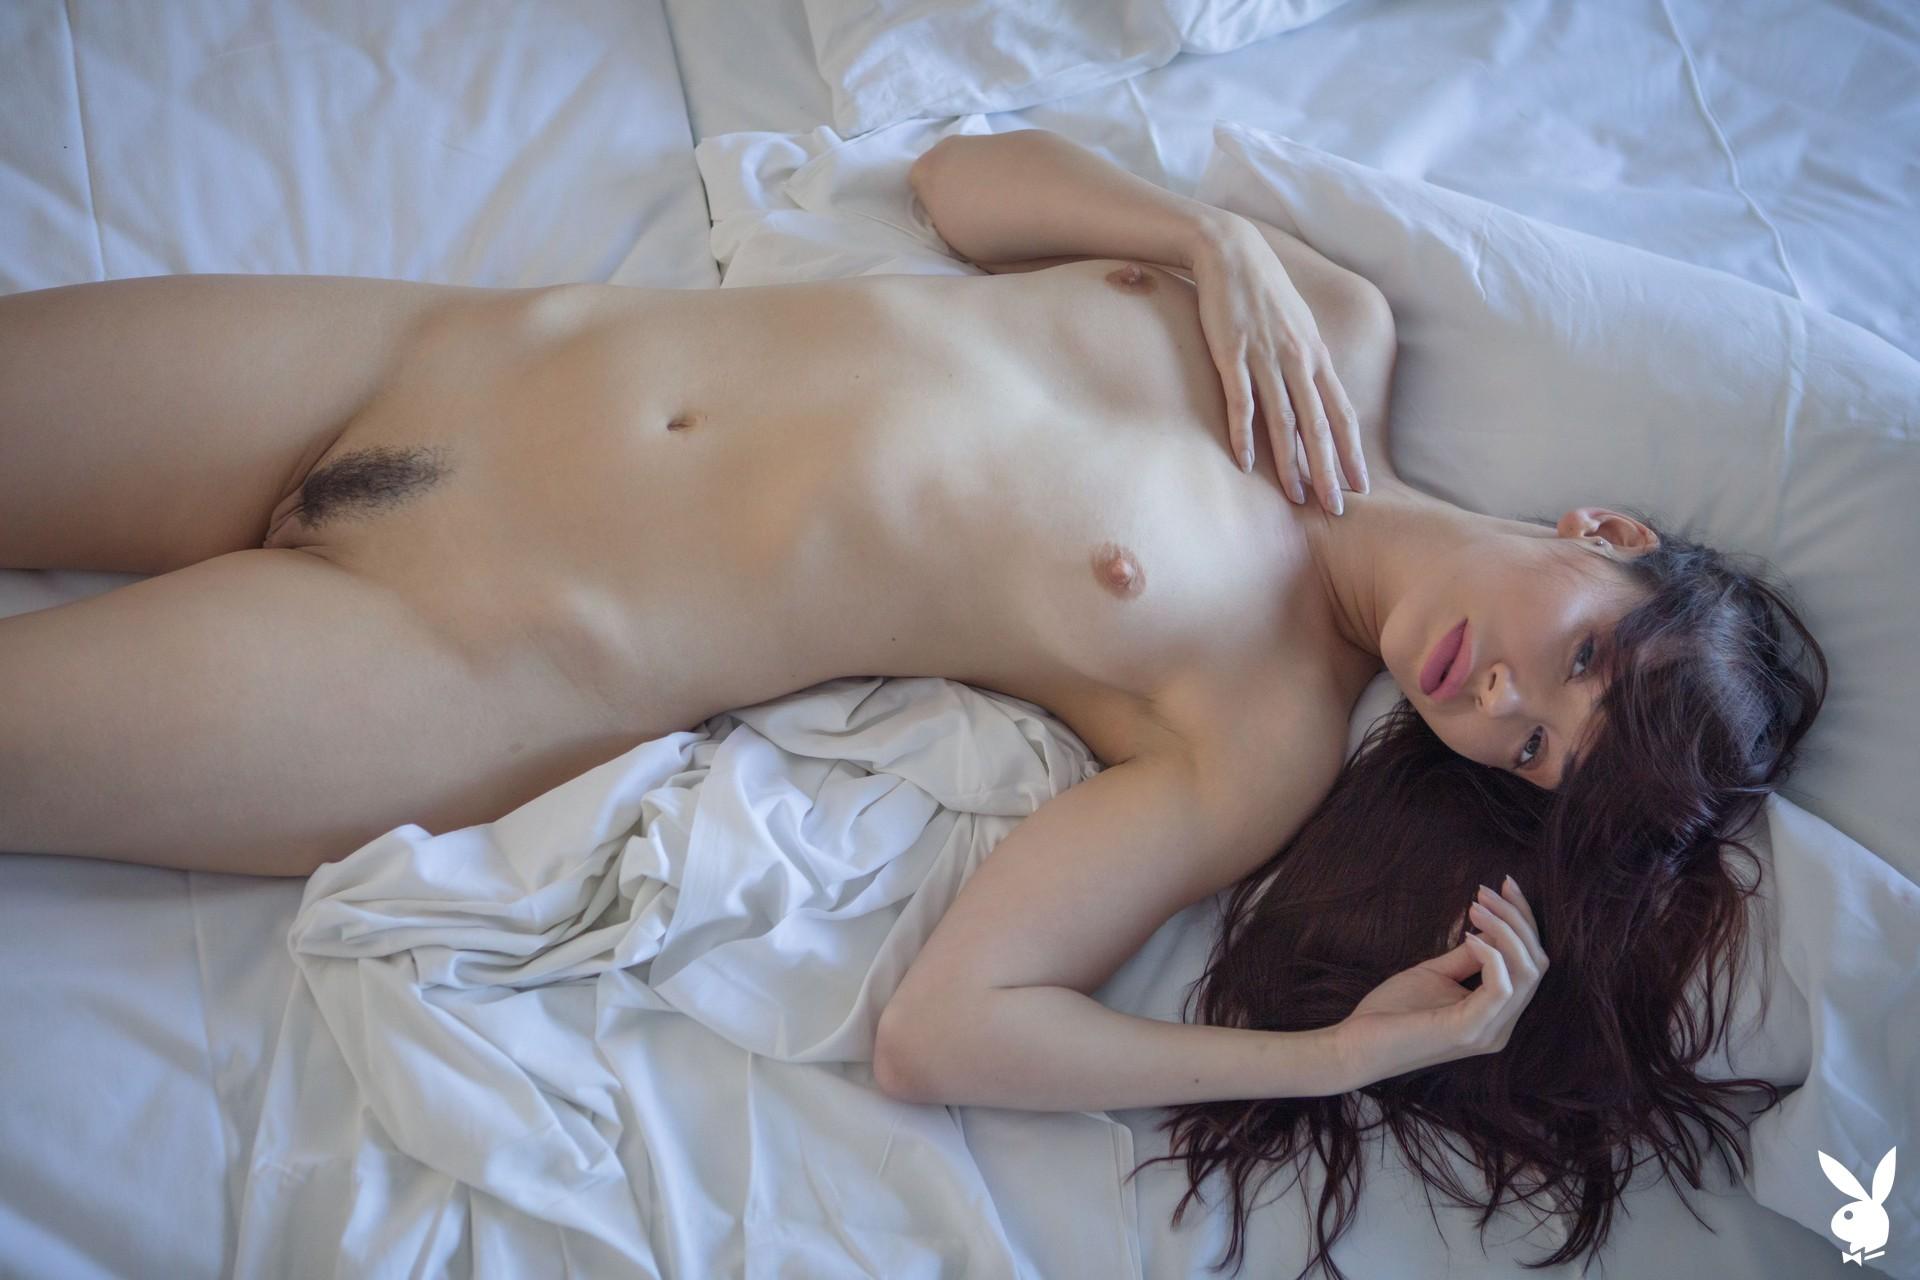 Elilith Noir In Tucked Away Playboy Plus (21)